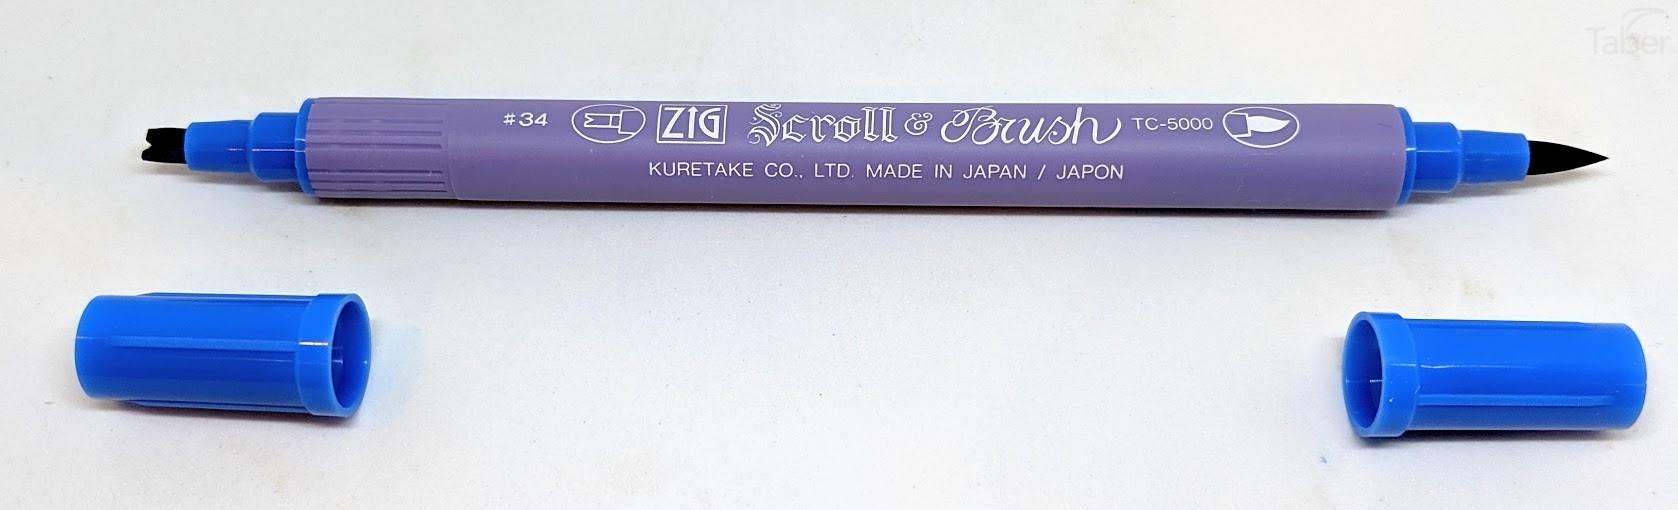 Zig Scroll & Brush Marker, Denim